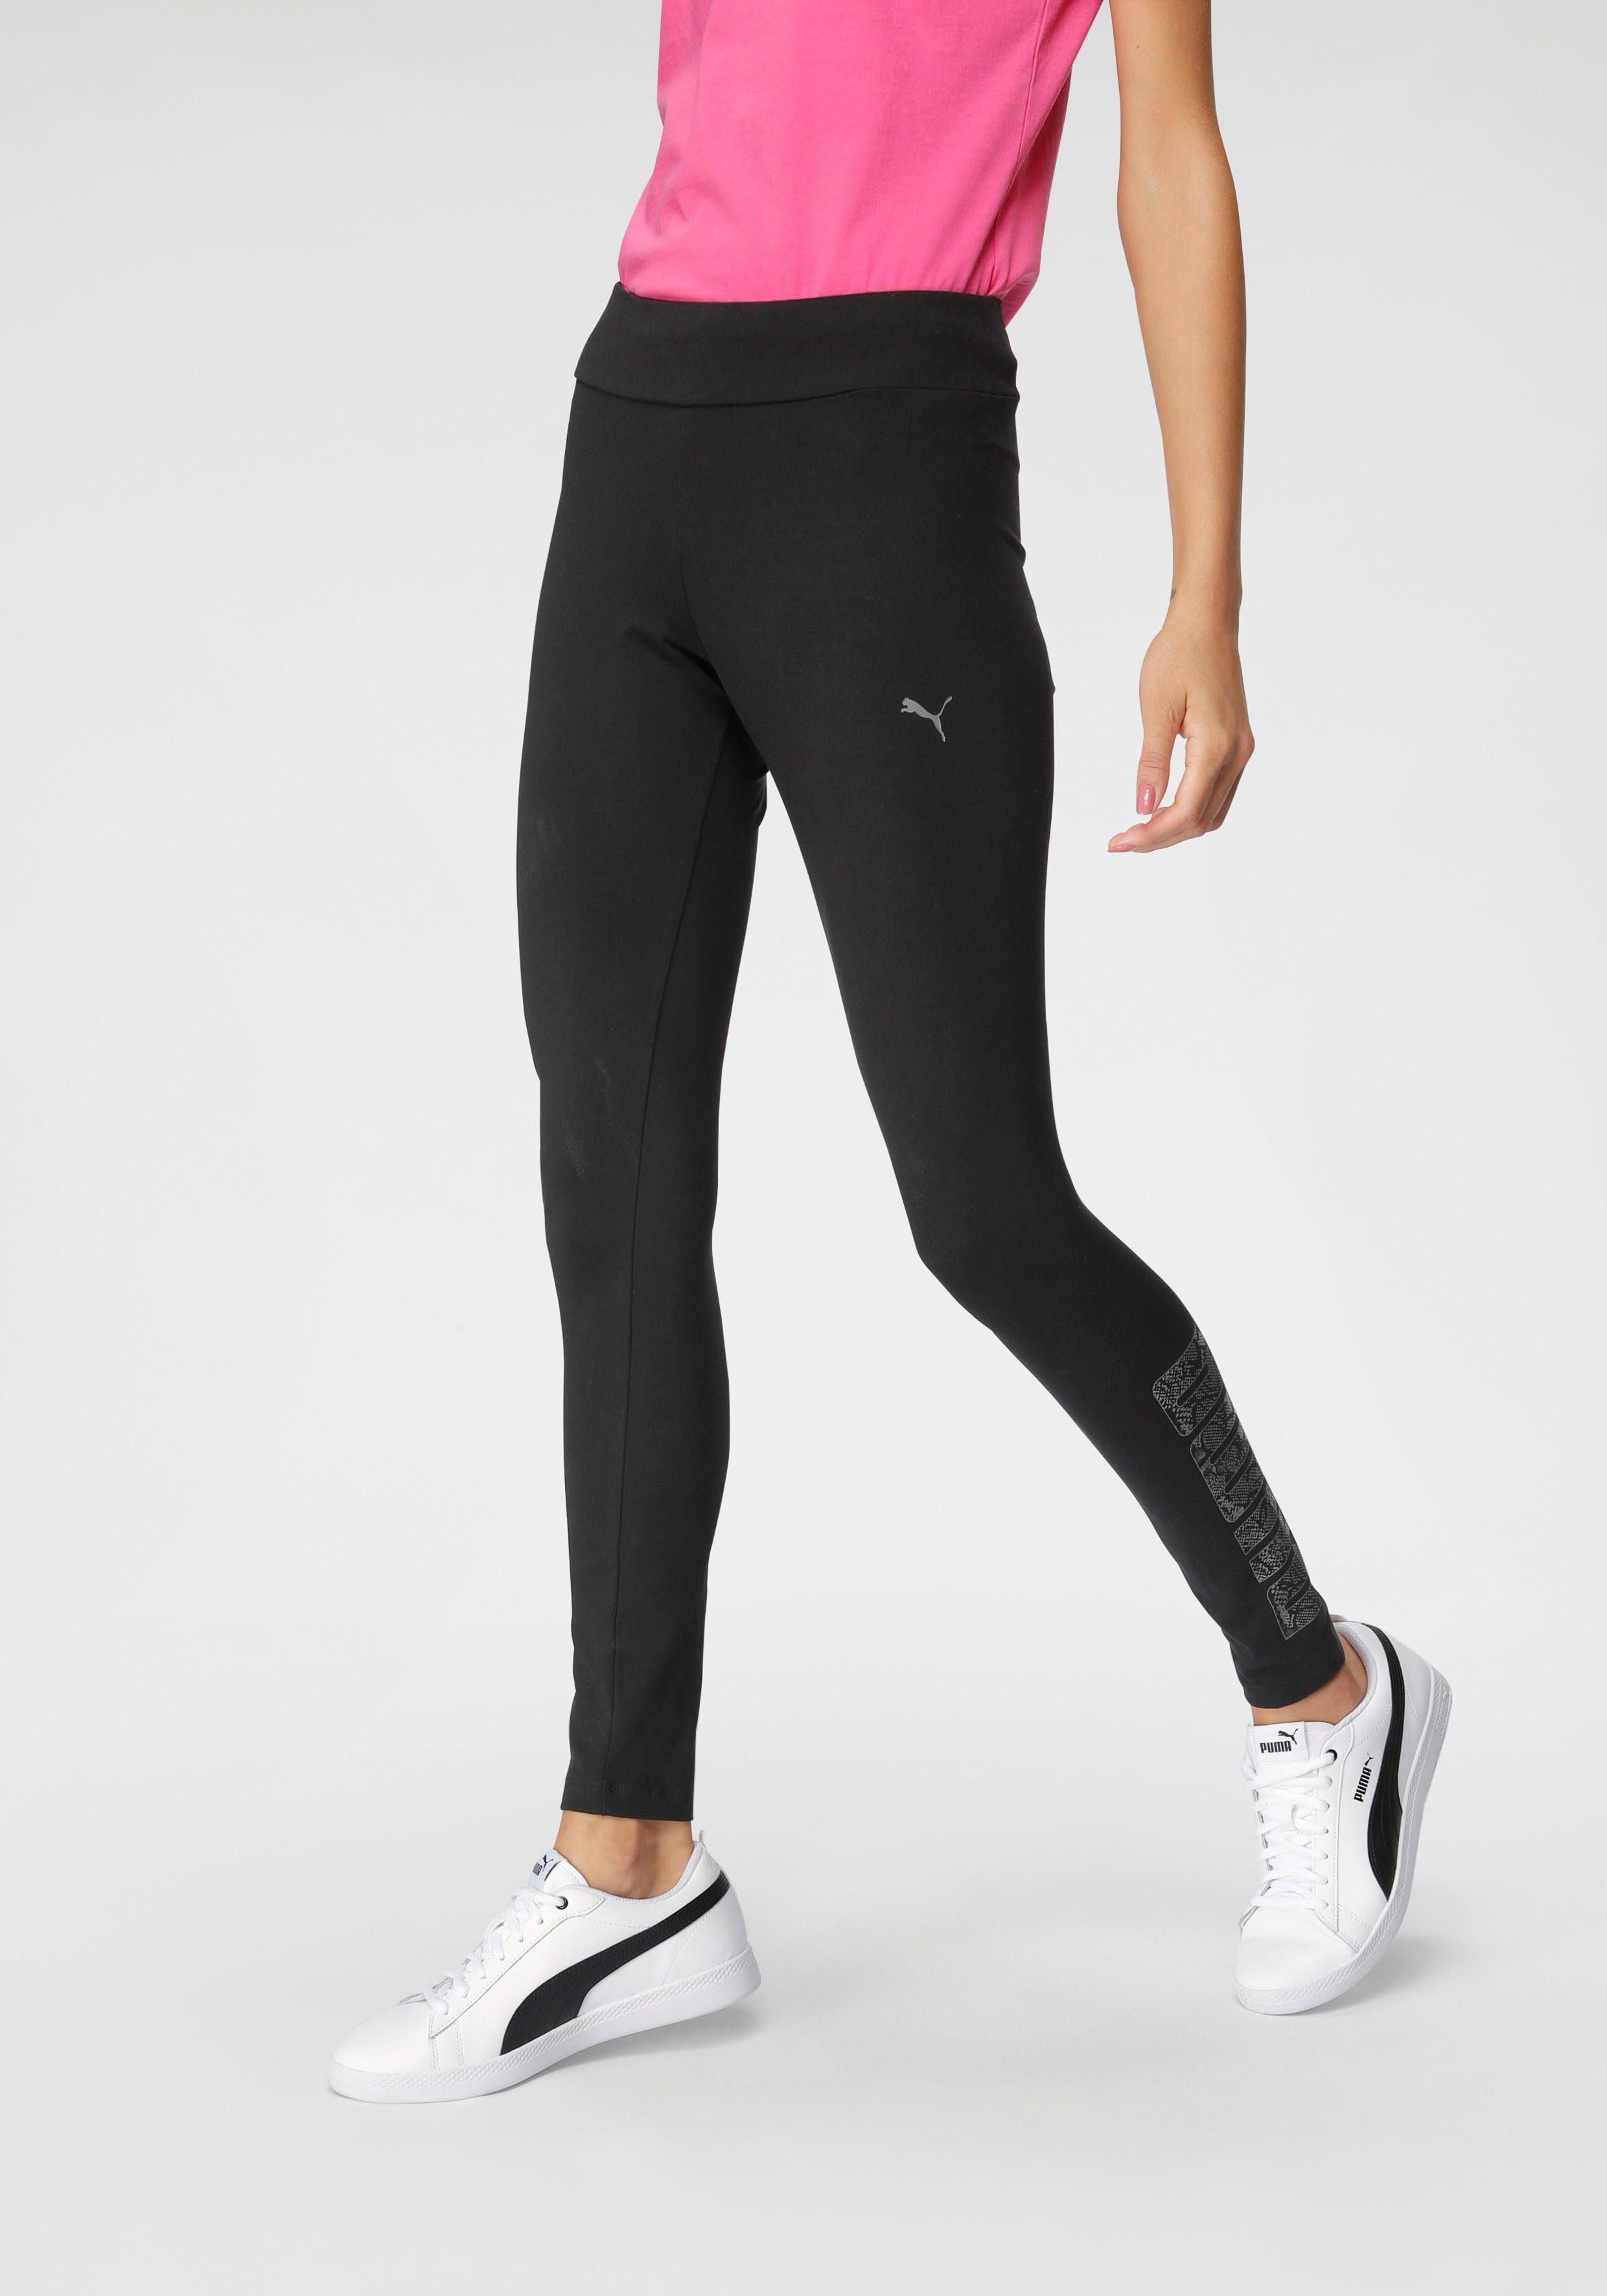 PUMA Leggings »KA Leggings« online kaufen | OTTO